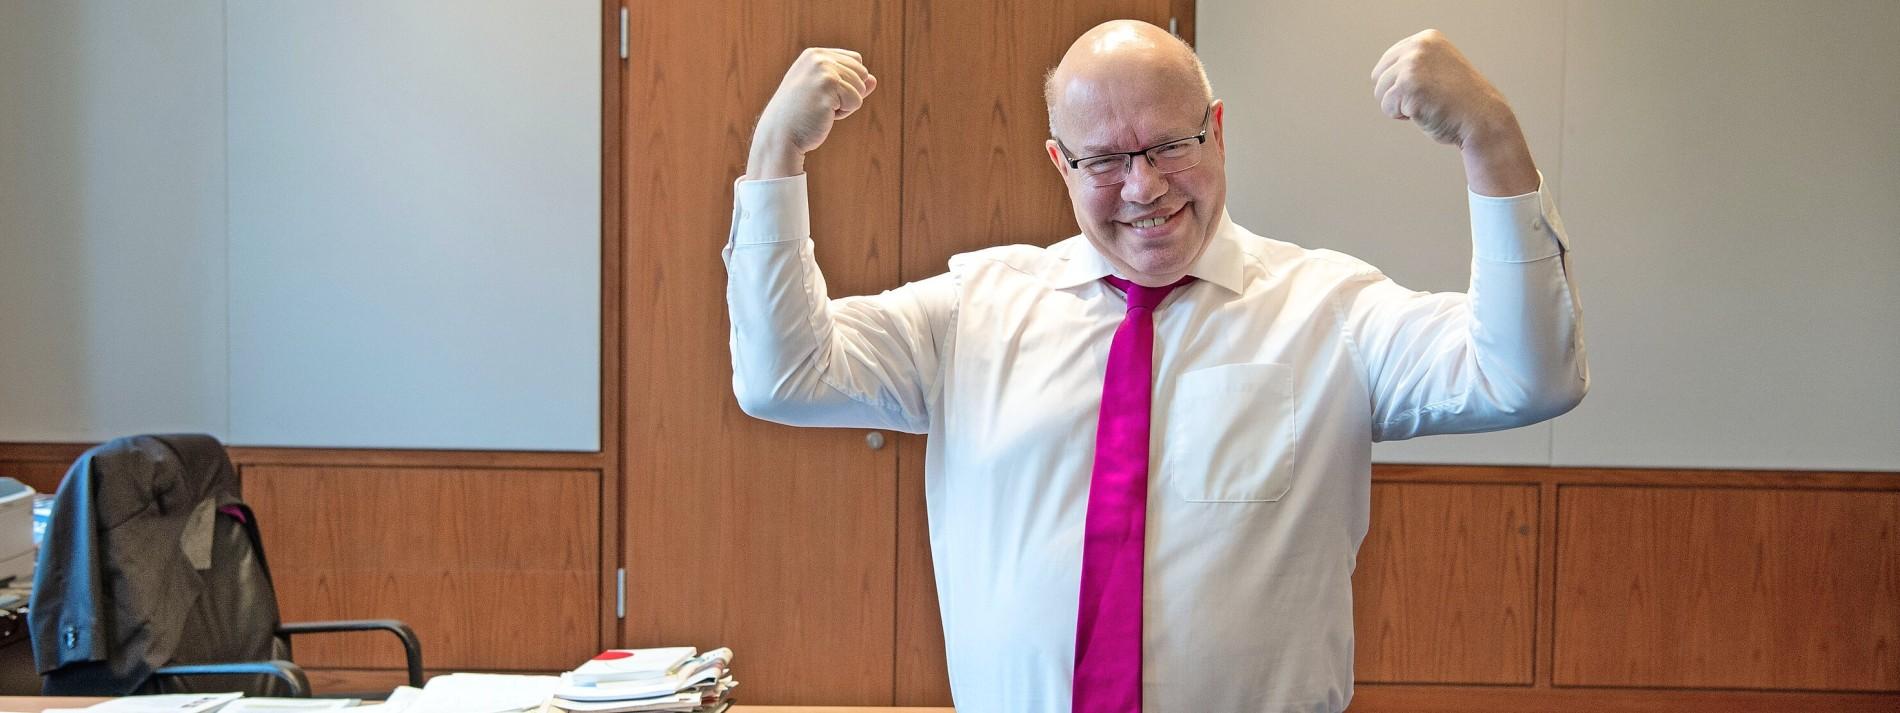 Erhards Erbe verabschiedet sich als Industriepolitiker